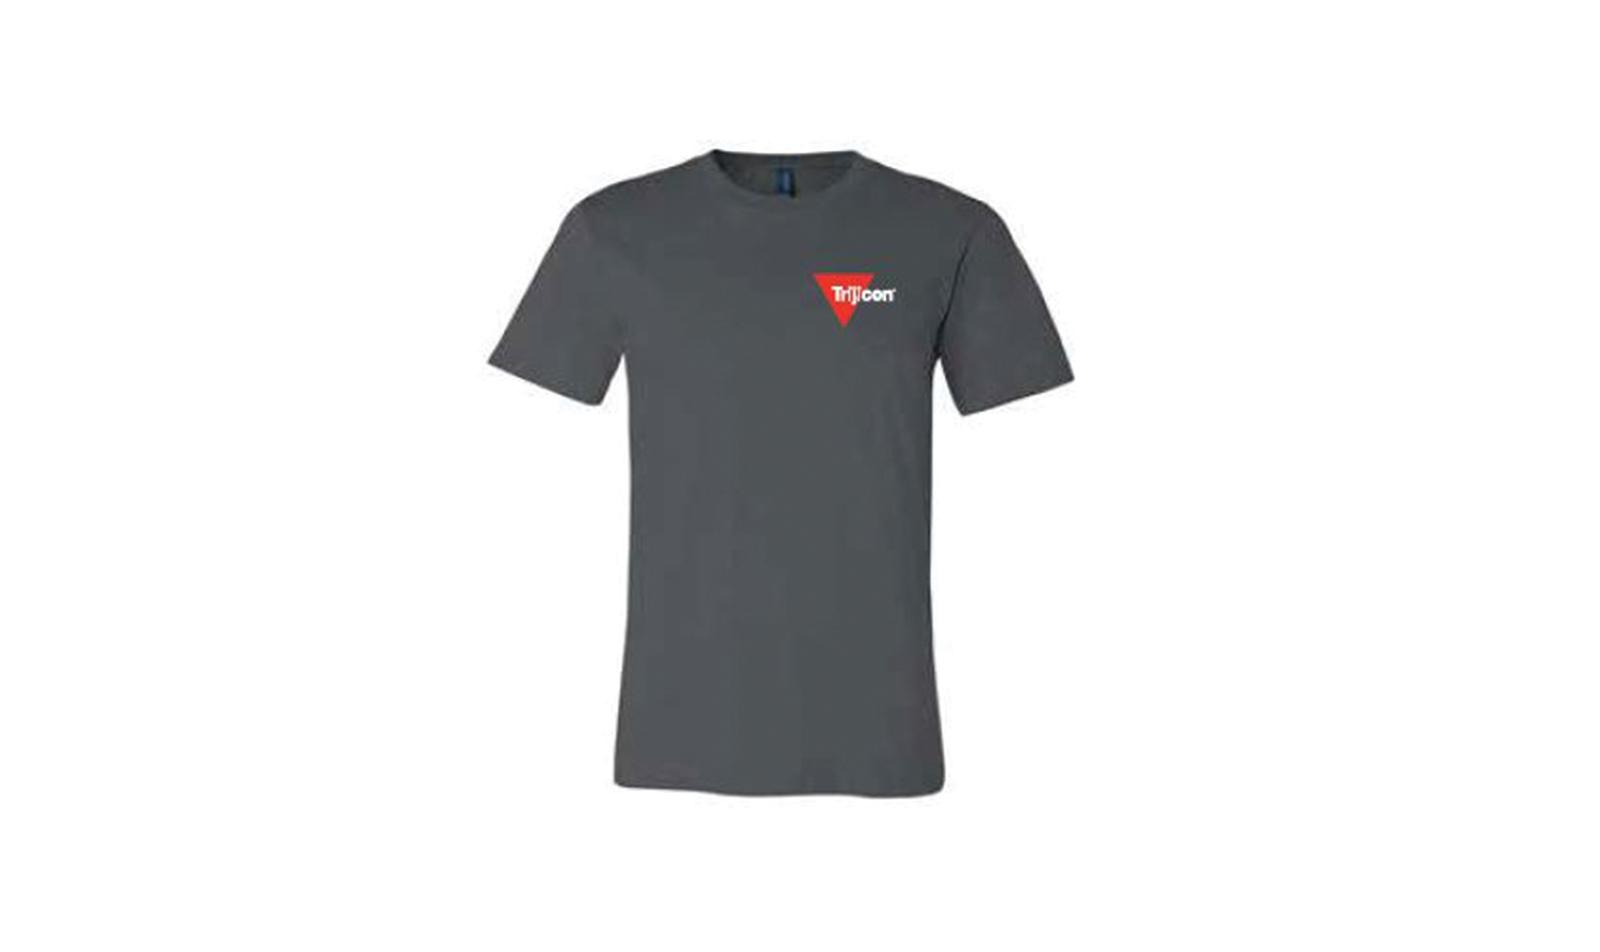 Trijicon<sup>®</sup> Jersey T-Shirt - Gray - SM